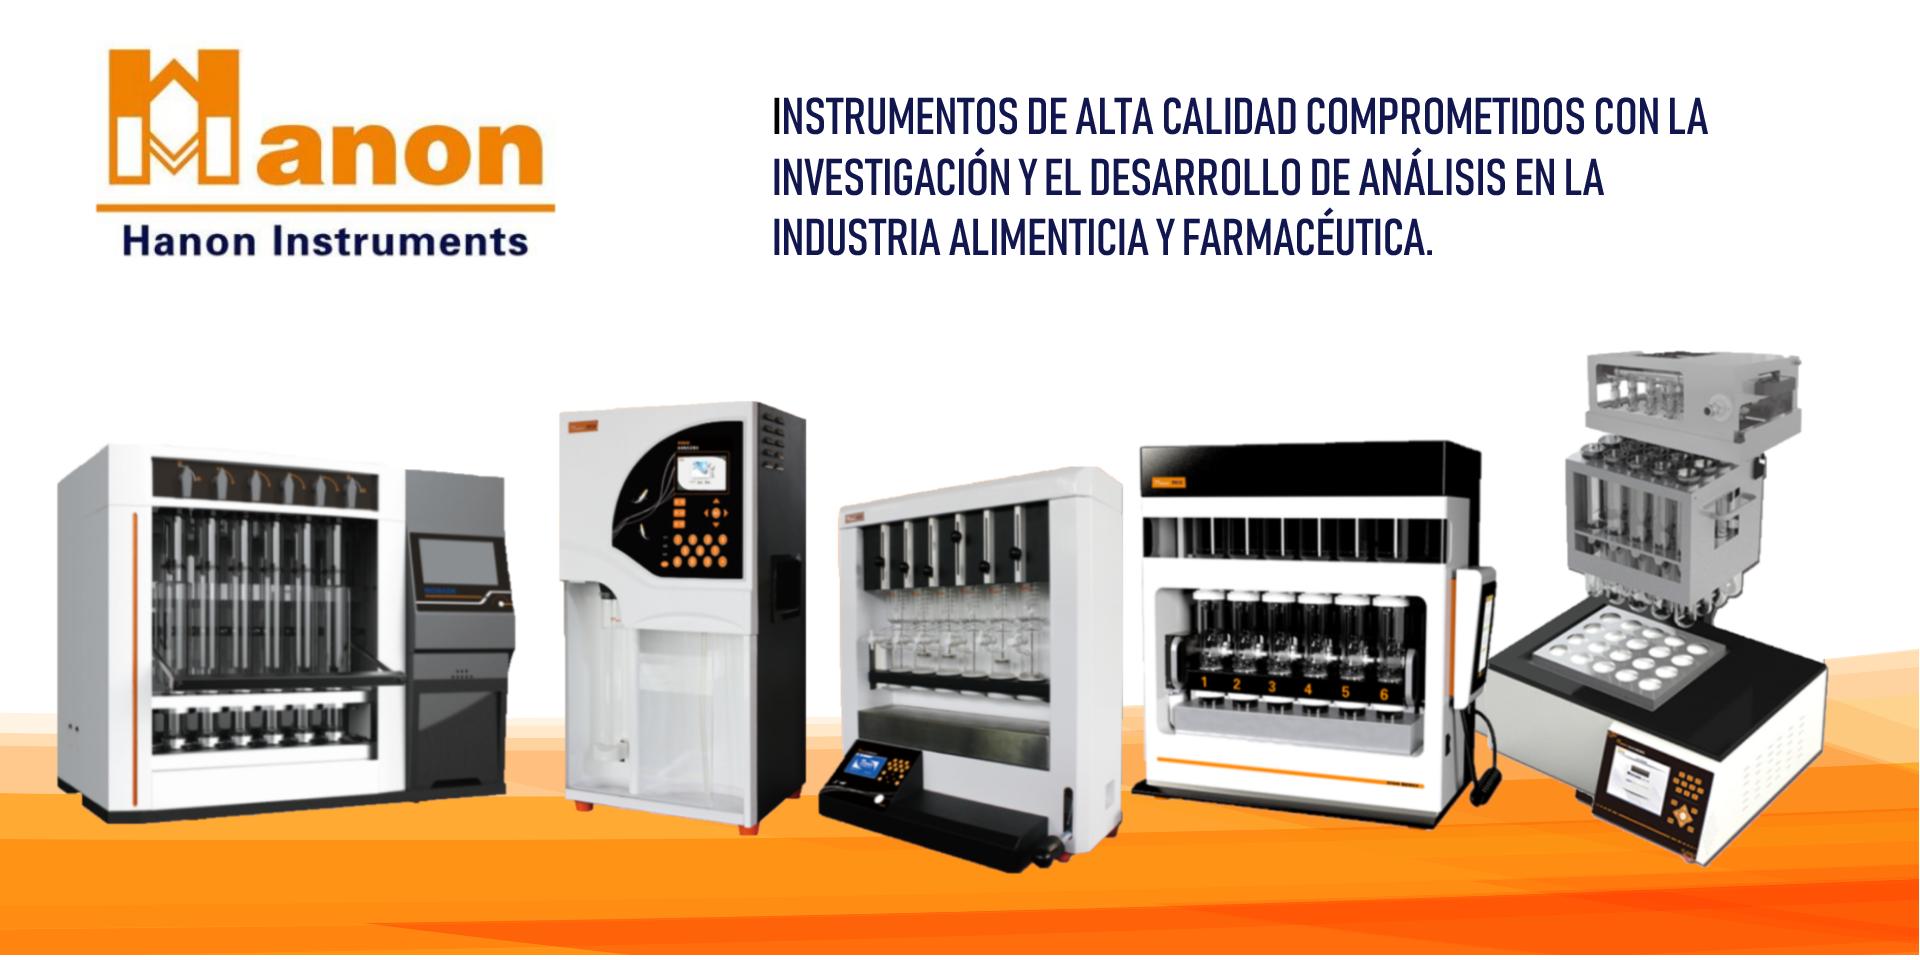 Analizador de fibra cruda, Analizador de proteínas, Analizadores Kjeldahl, Analizador de Proteínas, Kjeldahl, Hanon Instrumets